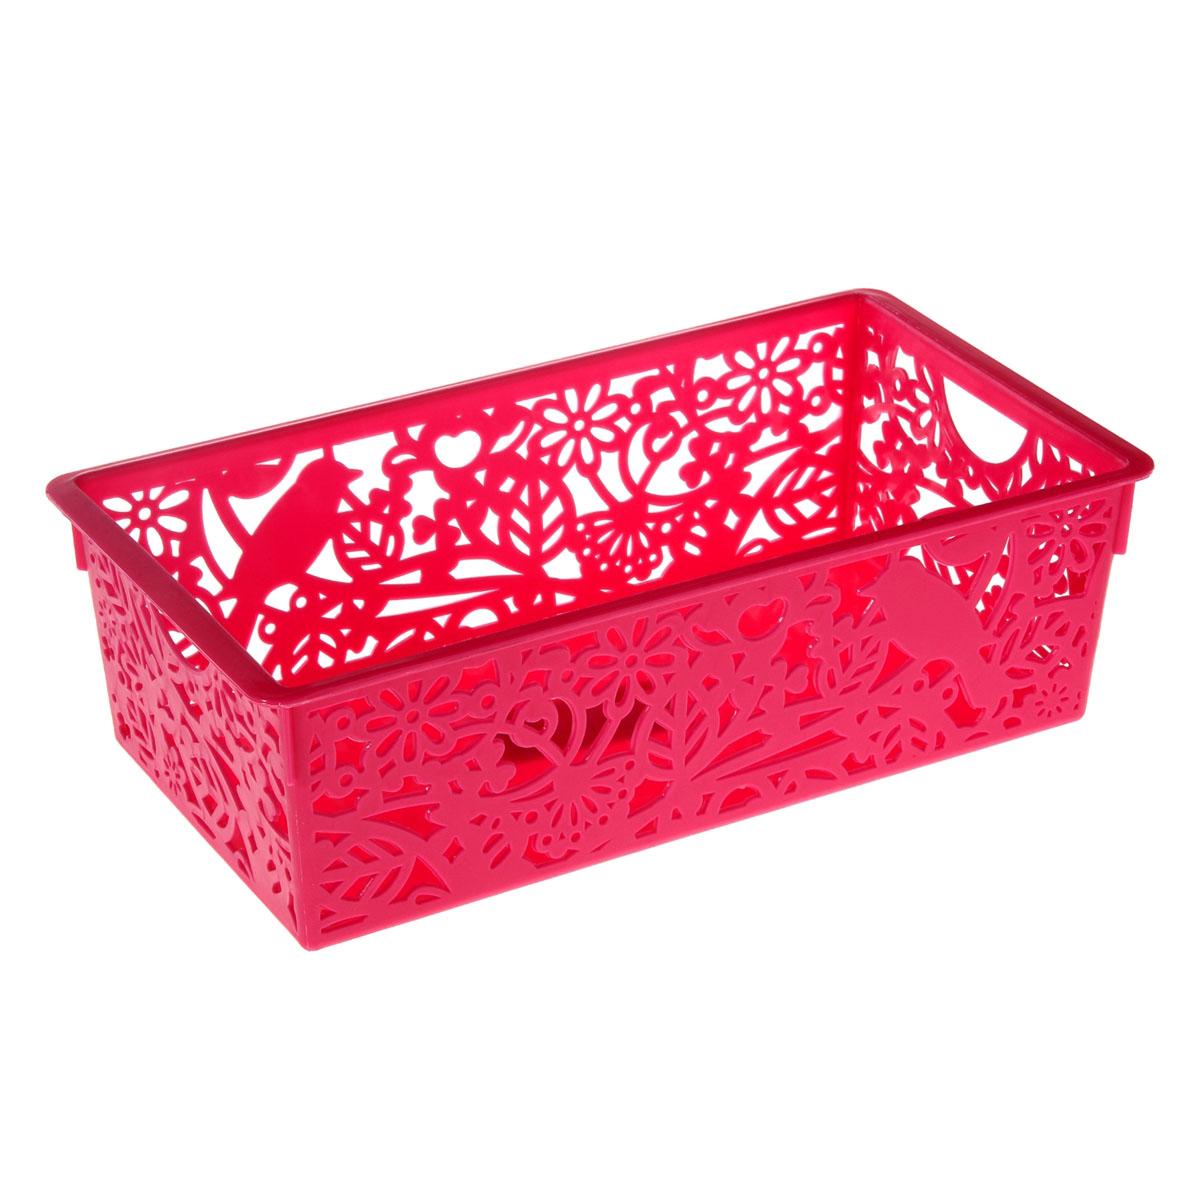 Корзина для мелочей Птицы, 14,5*27,5*8,5 см, цвет: розовый, 799920799920Корзина для мелочей Птицы, 14,5*27,5*8,5 см, 799920 Материал: Пластик